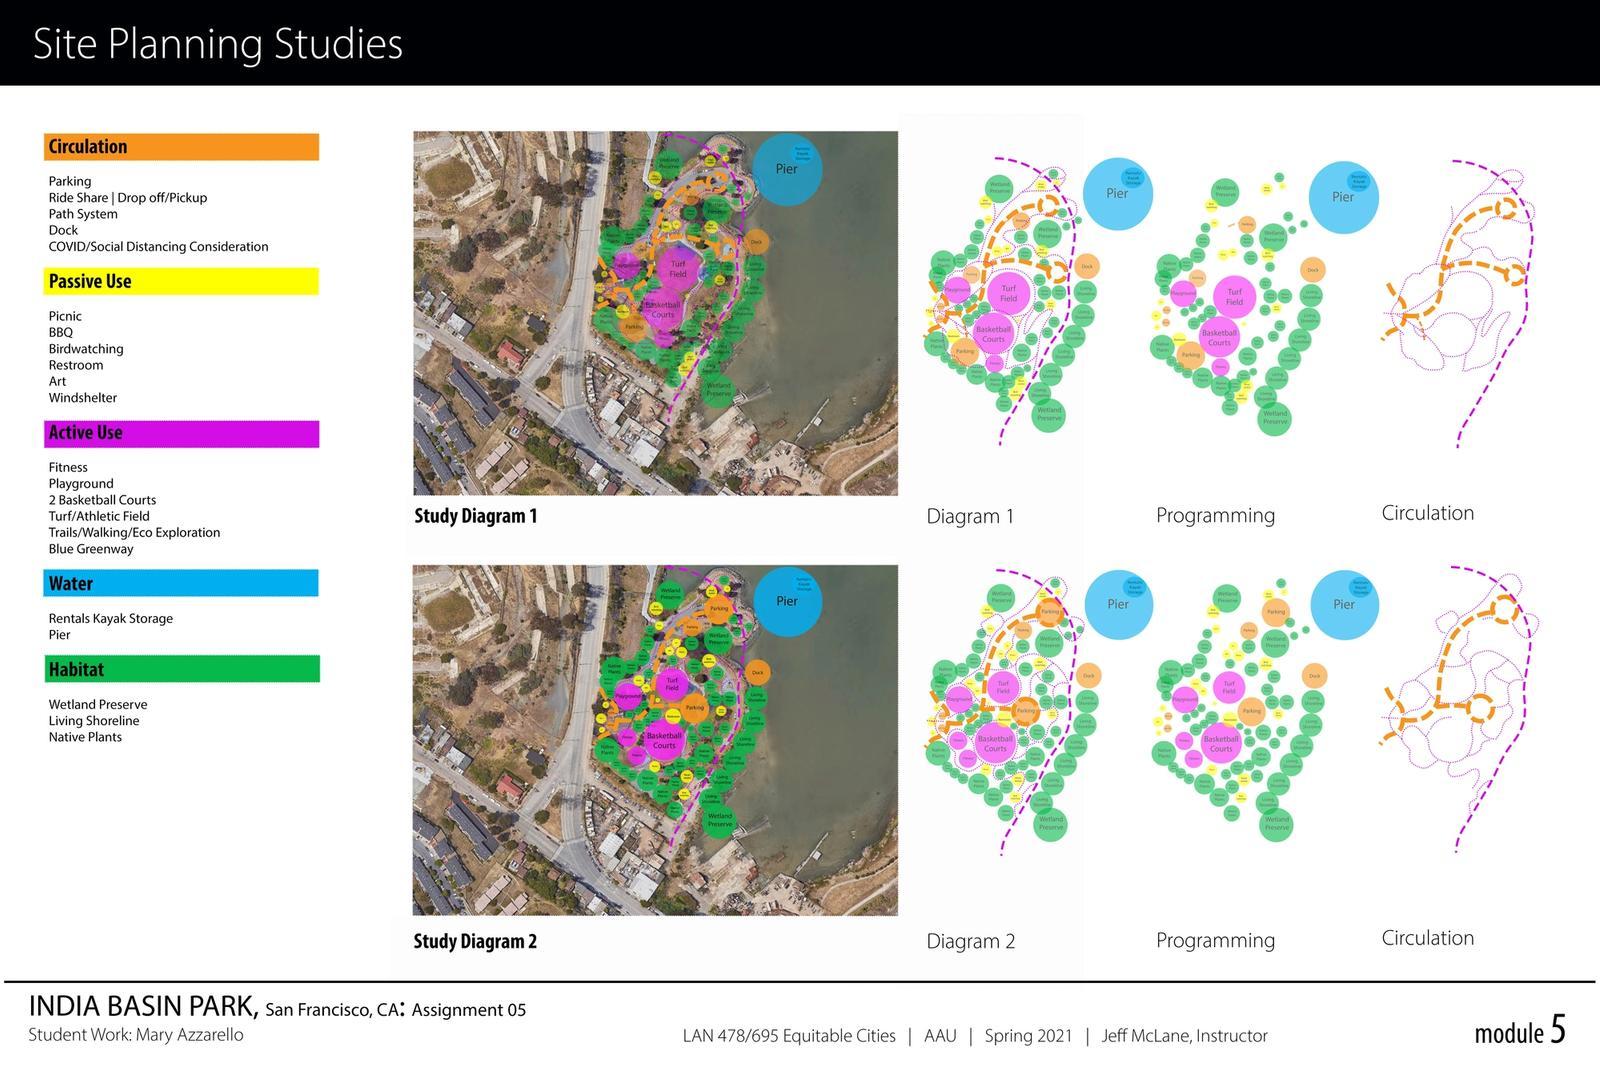 India Basin Park, San Francisco - Site Planning Studies 1